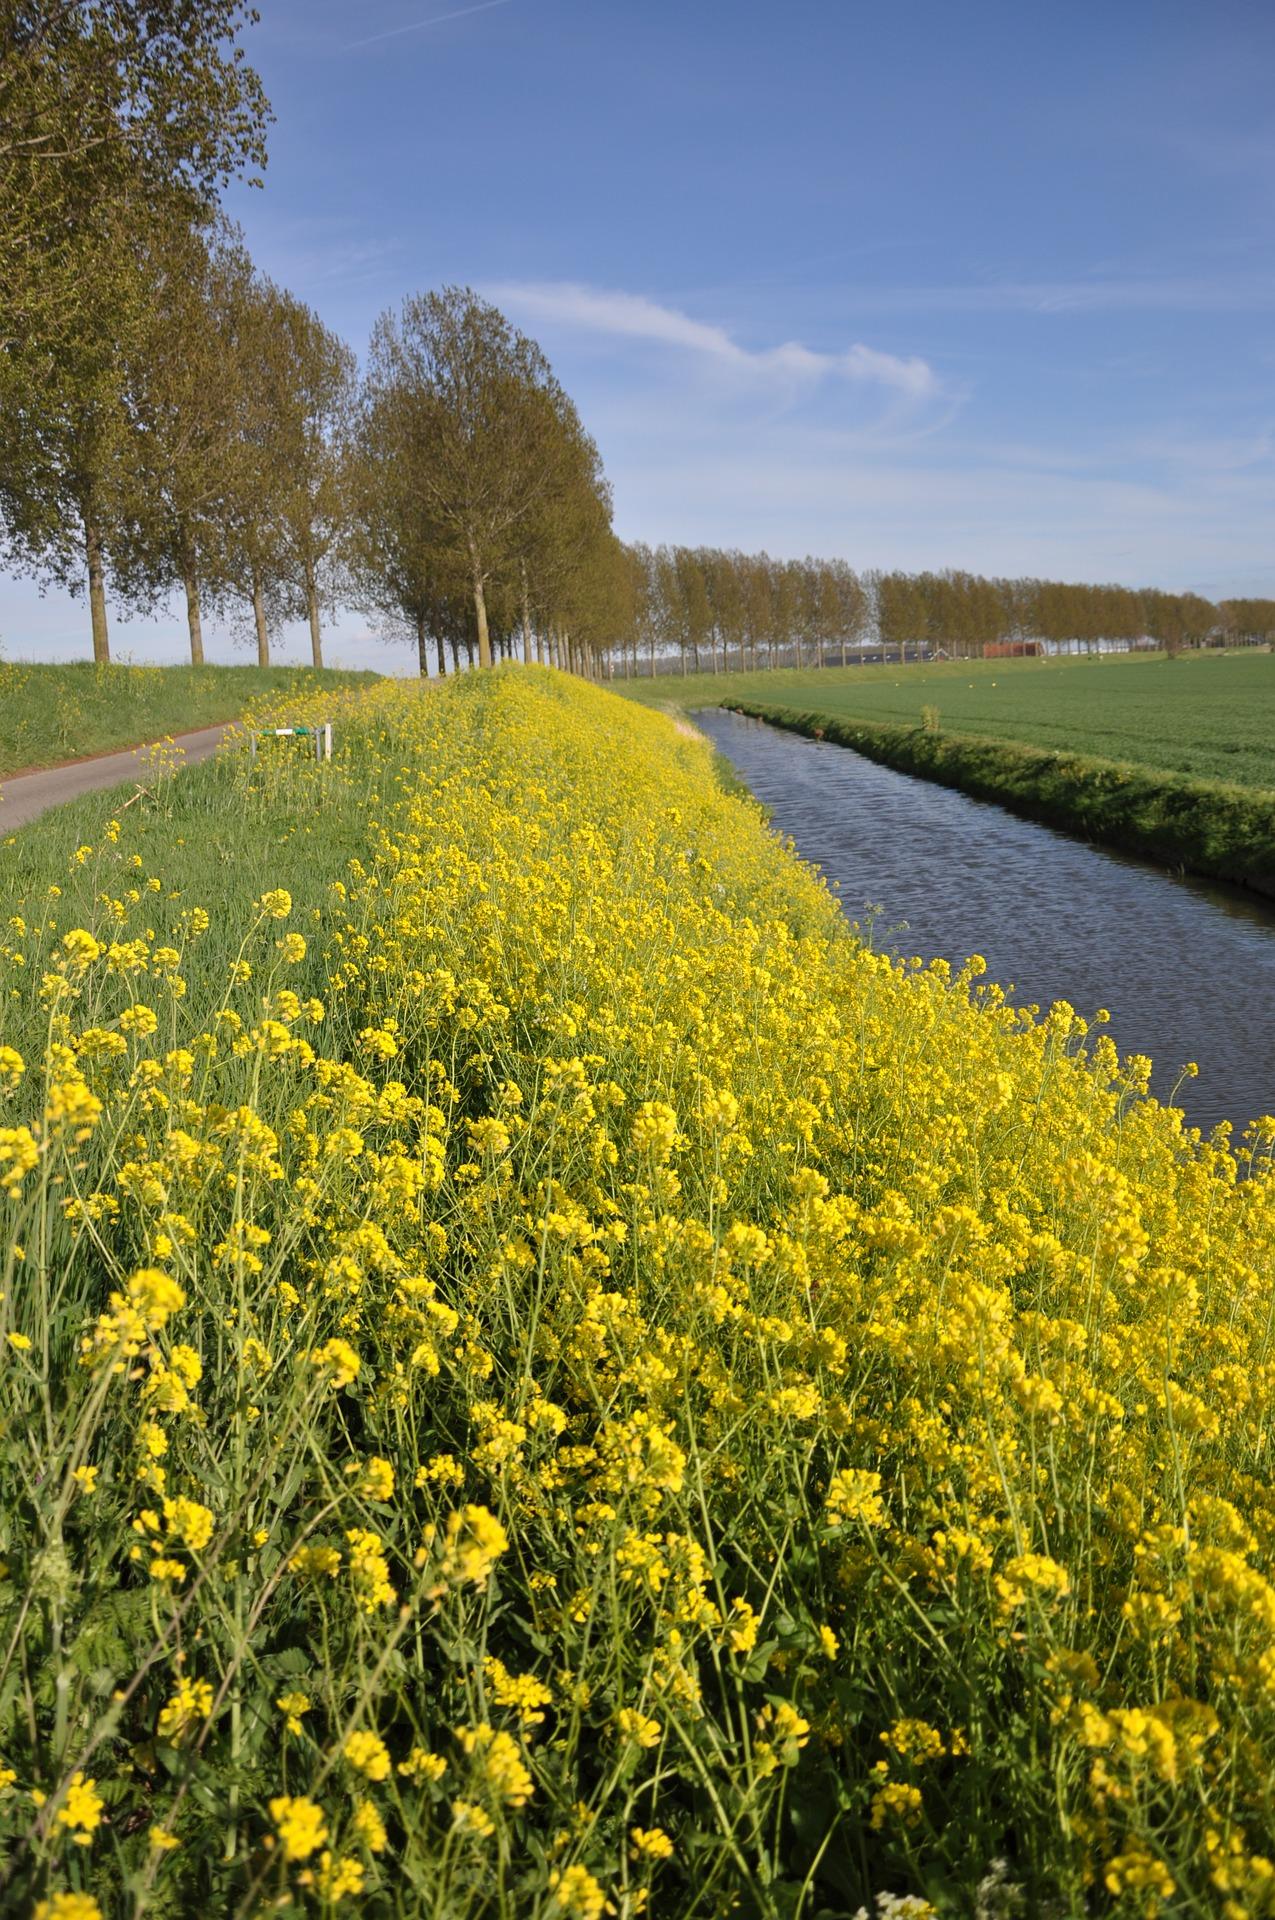 mustard-seed-2133041_1920.jpg